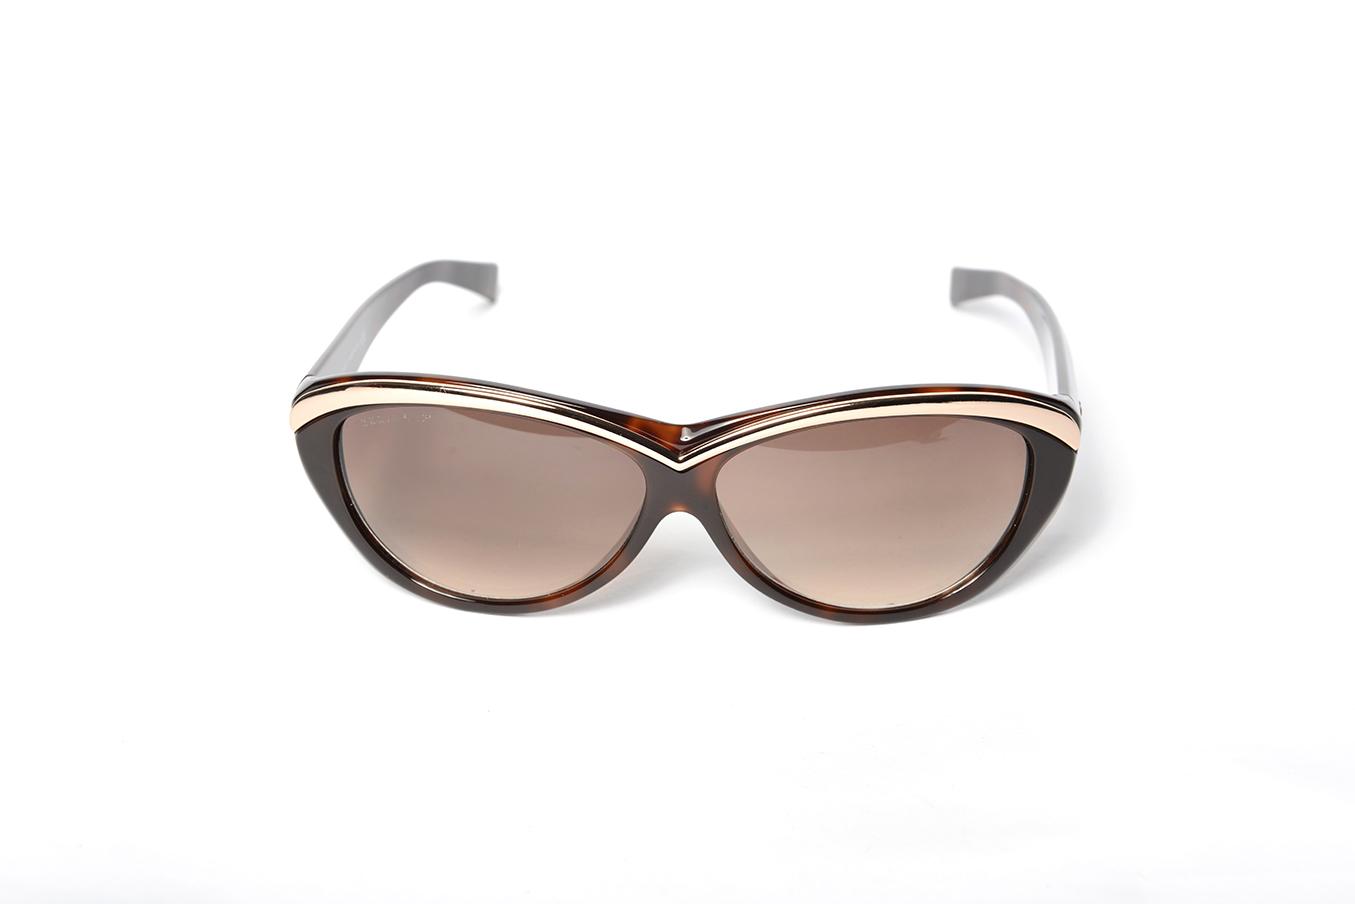 Lenny Face With Sunglasses   David Simchi-Levi 9c15940ccecc